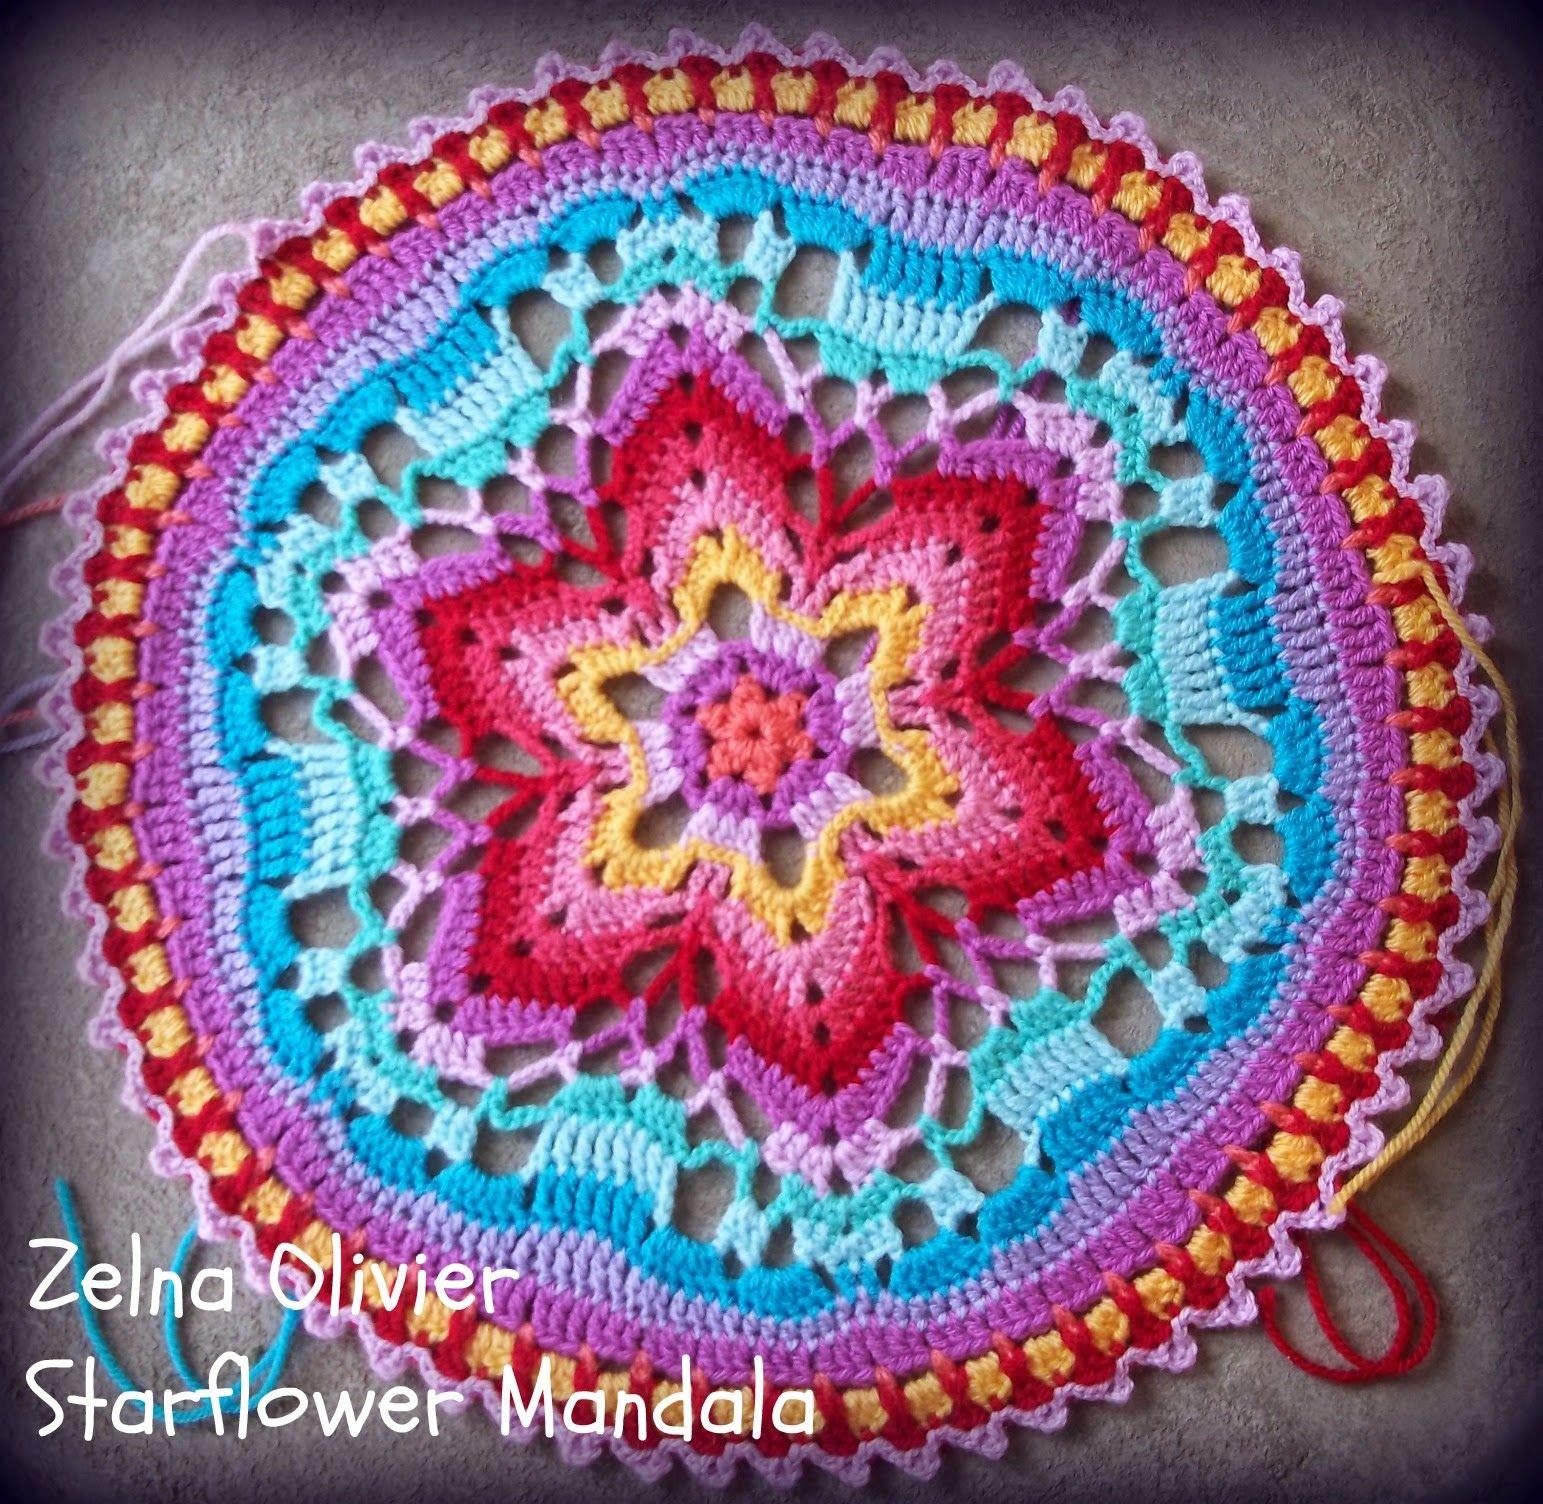 Starflower Mandala Pattern Kostenlose Anleitung Häkeln